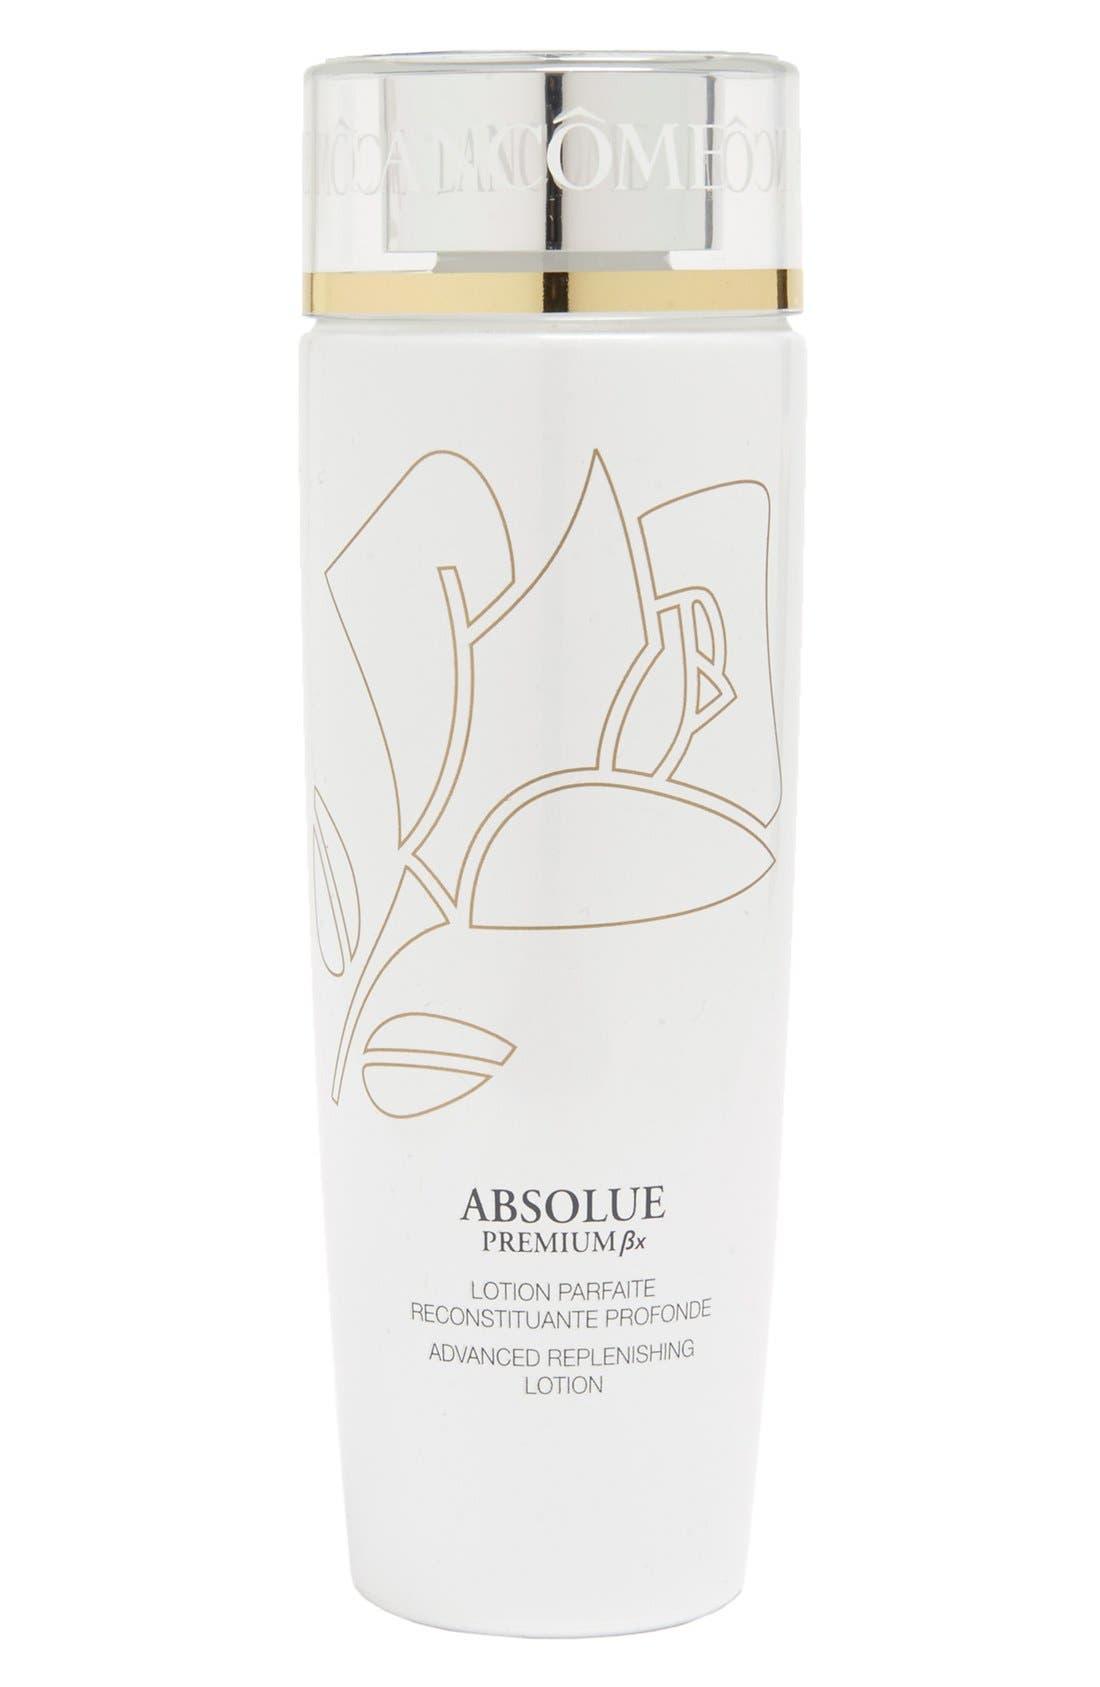 Lancôme Absolue Replenishing Lotion